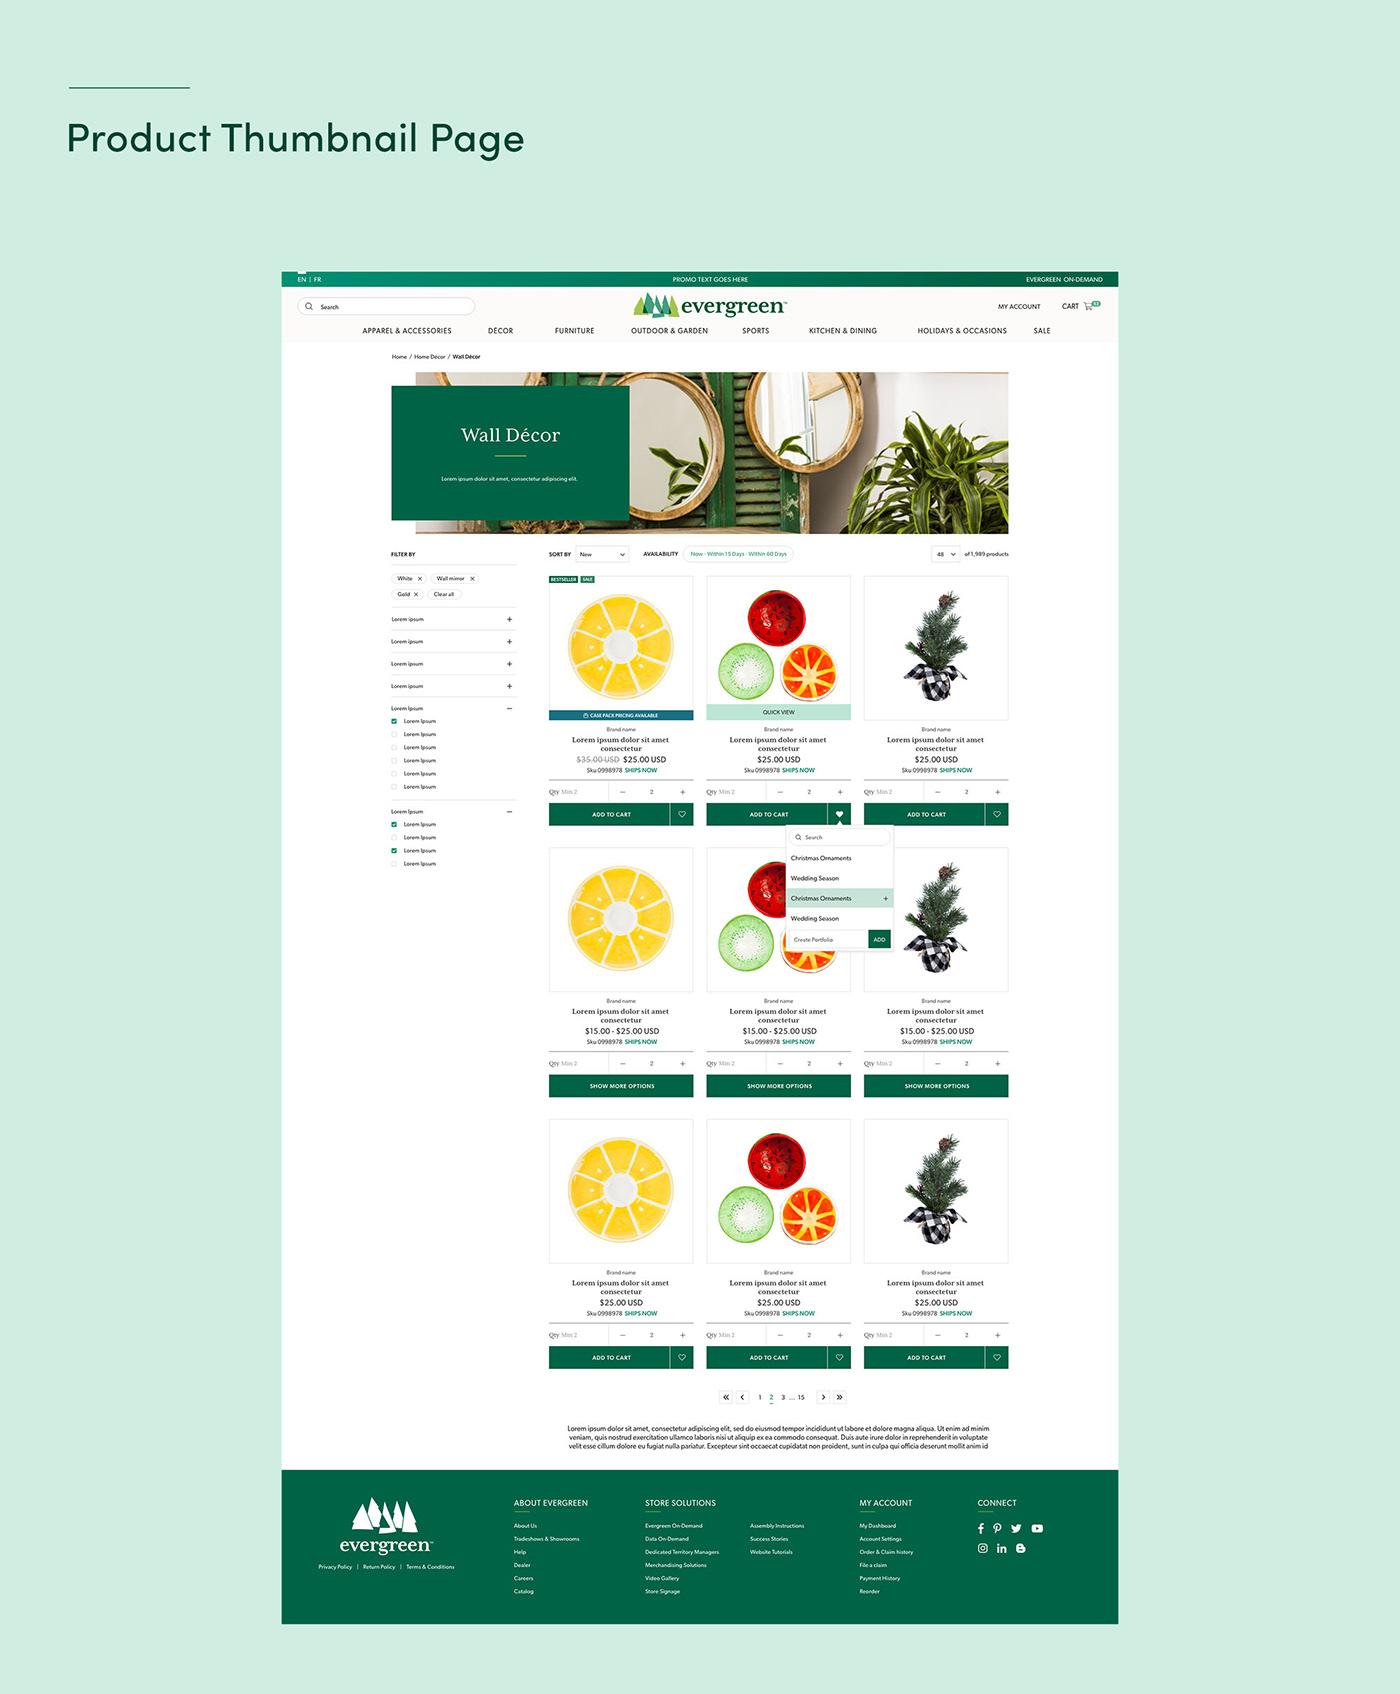 b2b mobile user experience user interface Website Design